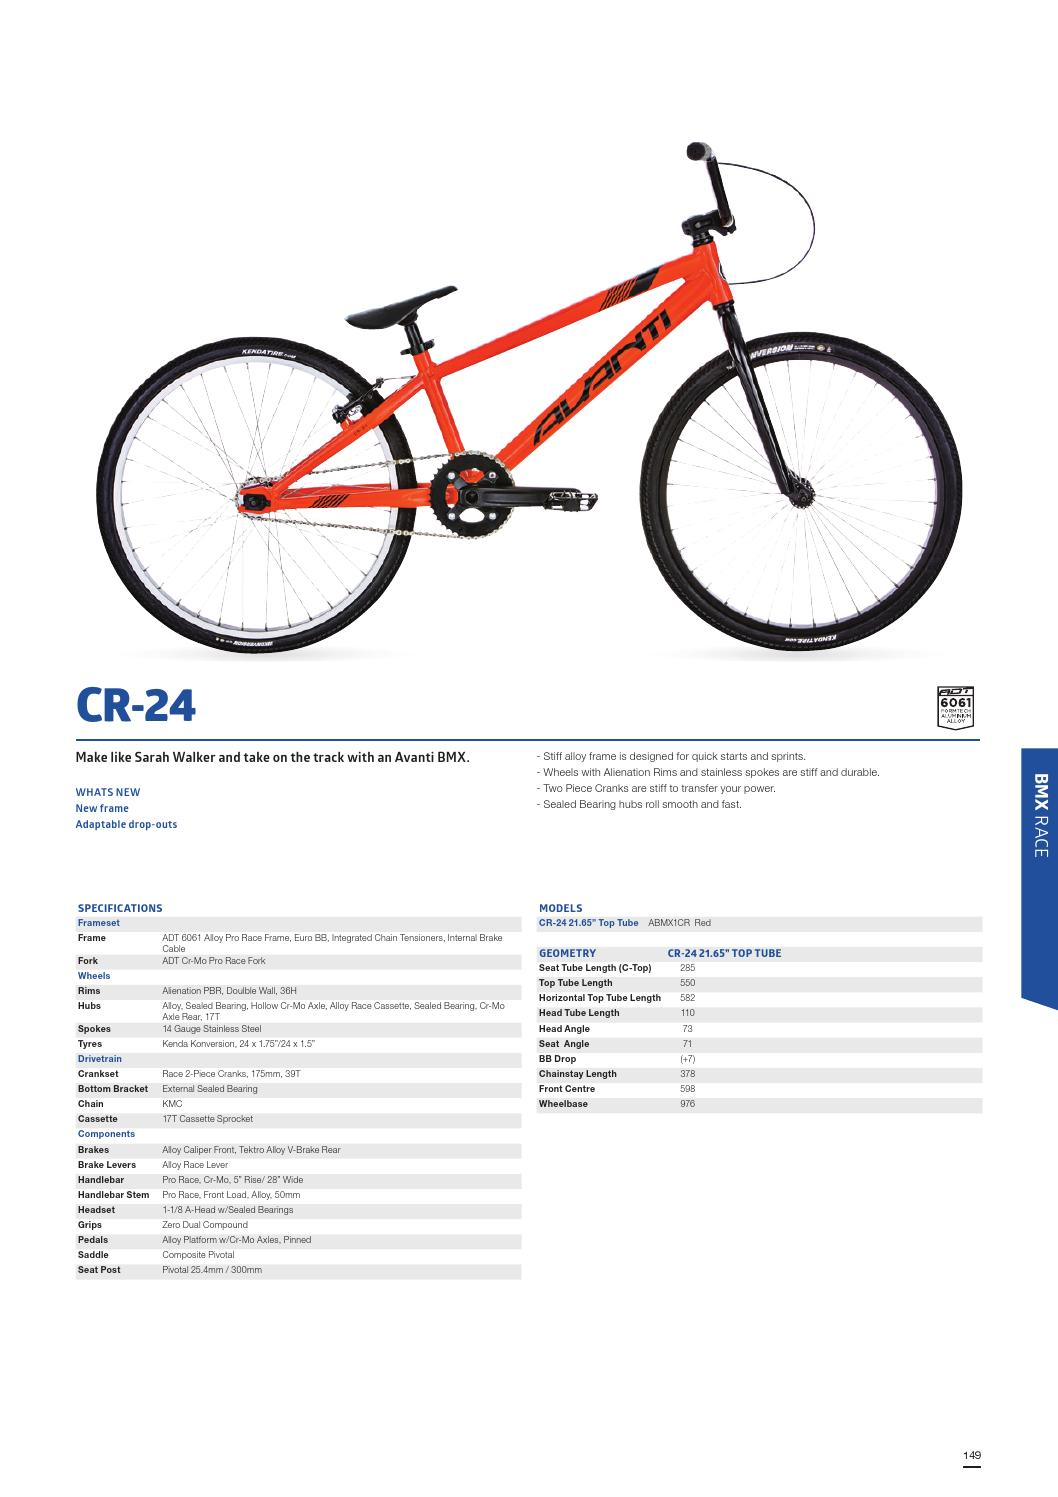 2016 Avanti Dealer Manual by AvantiPlus Cycles - issuu